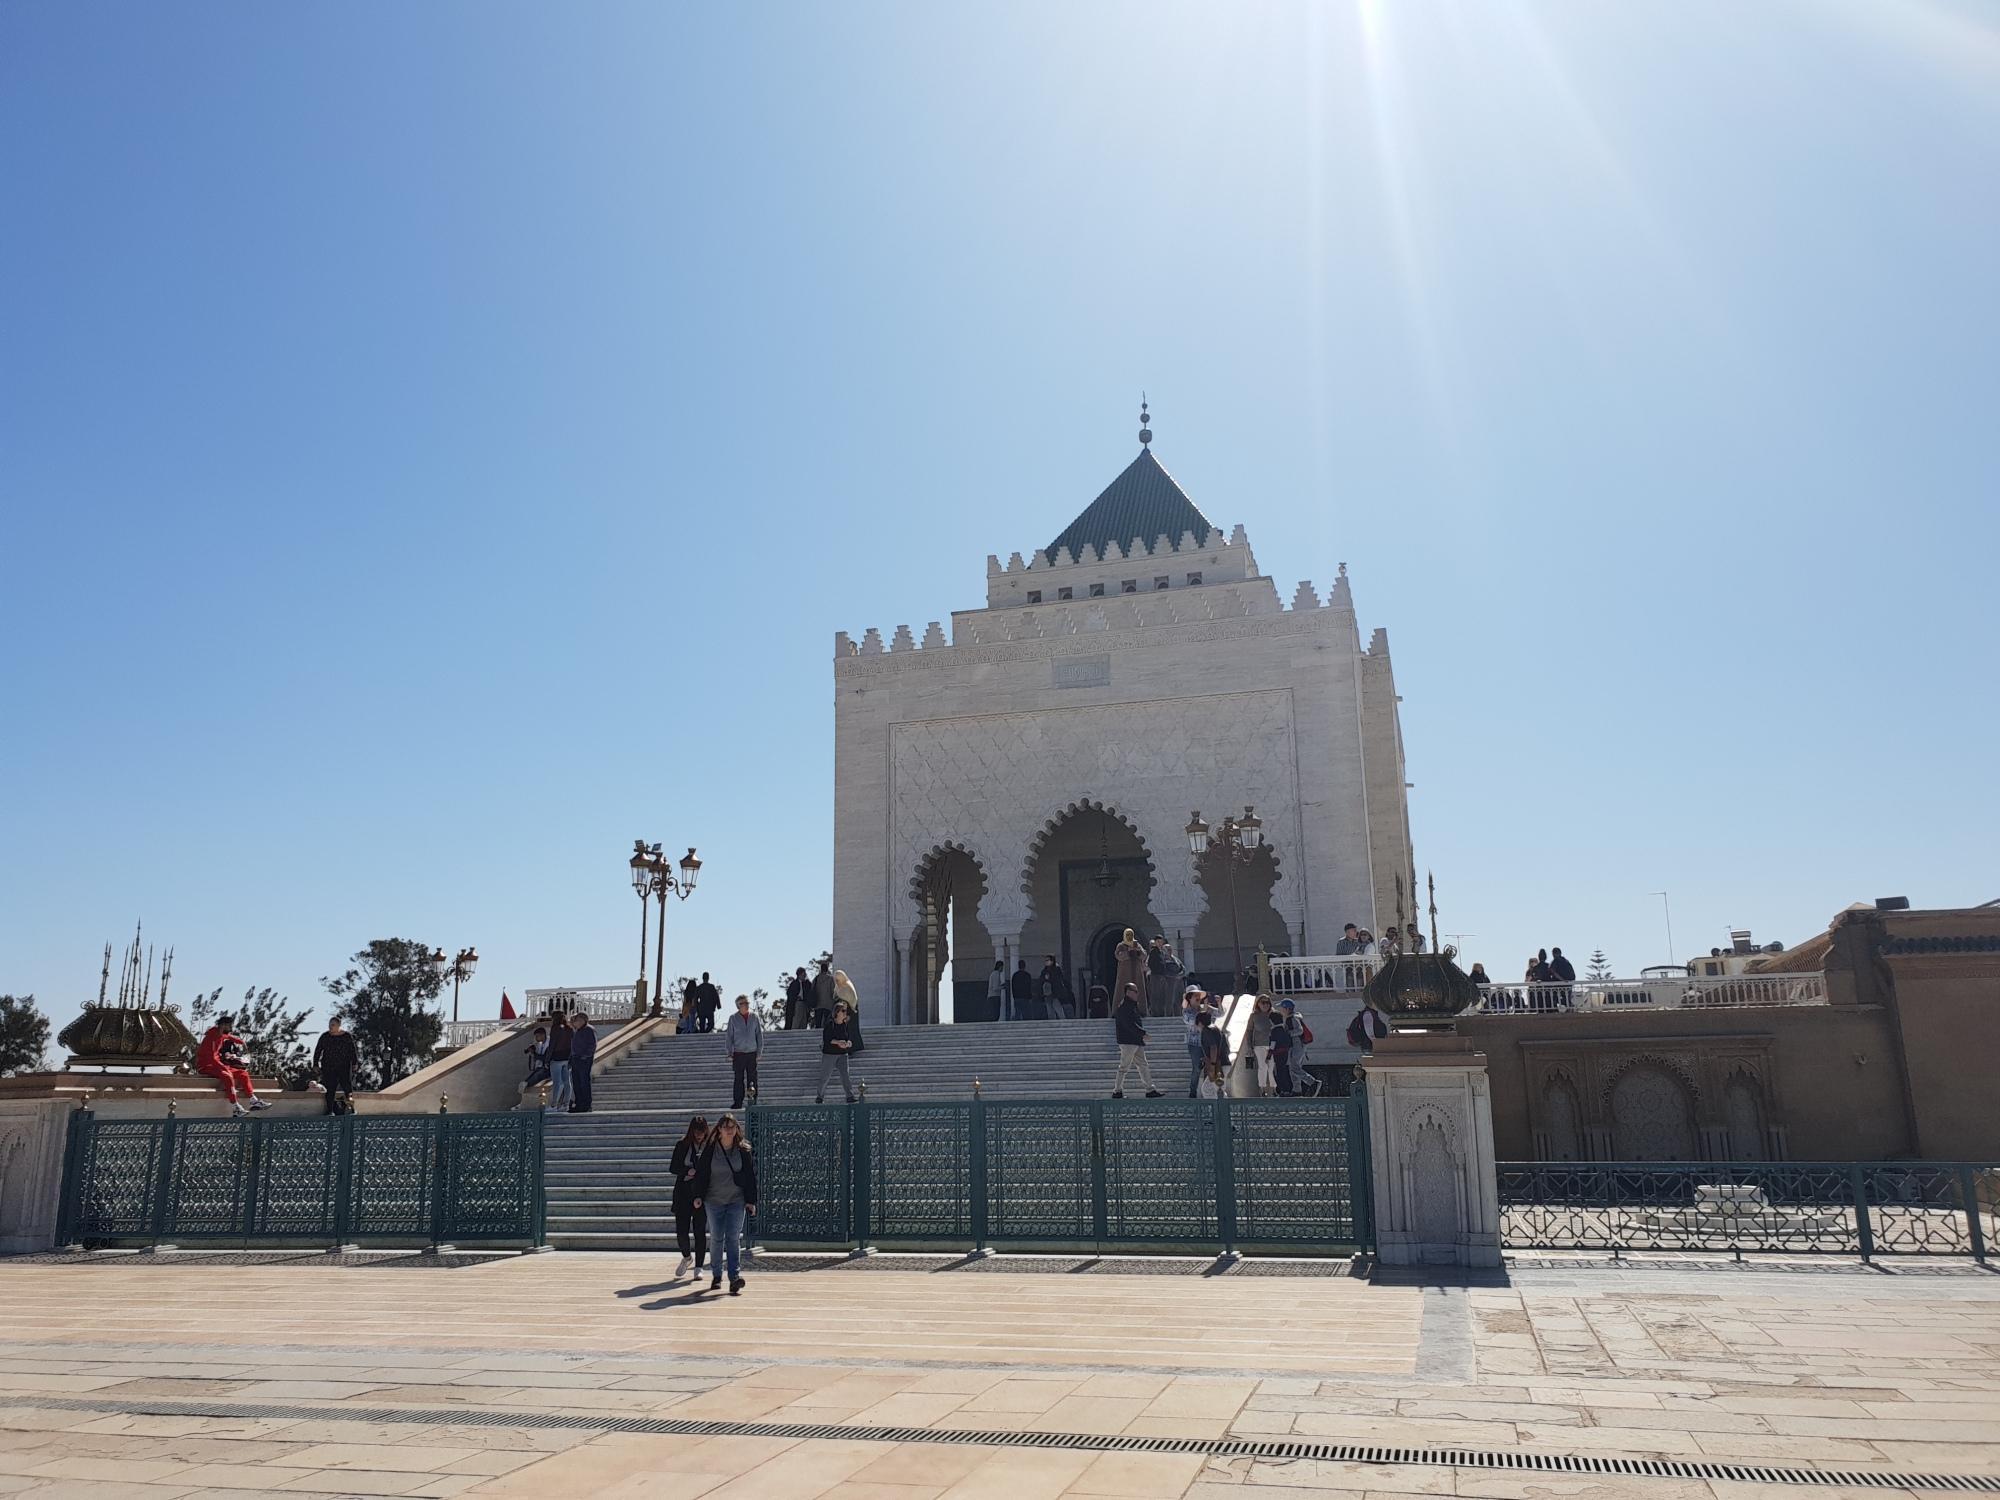 Le mausolée Mohammed V a Rabat au Maroc